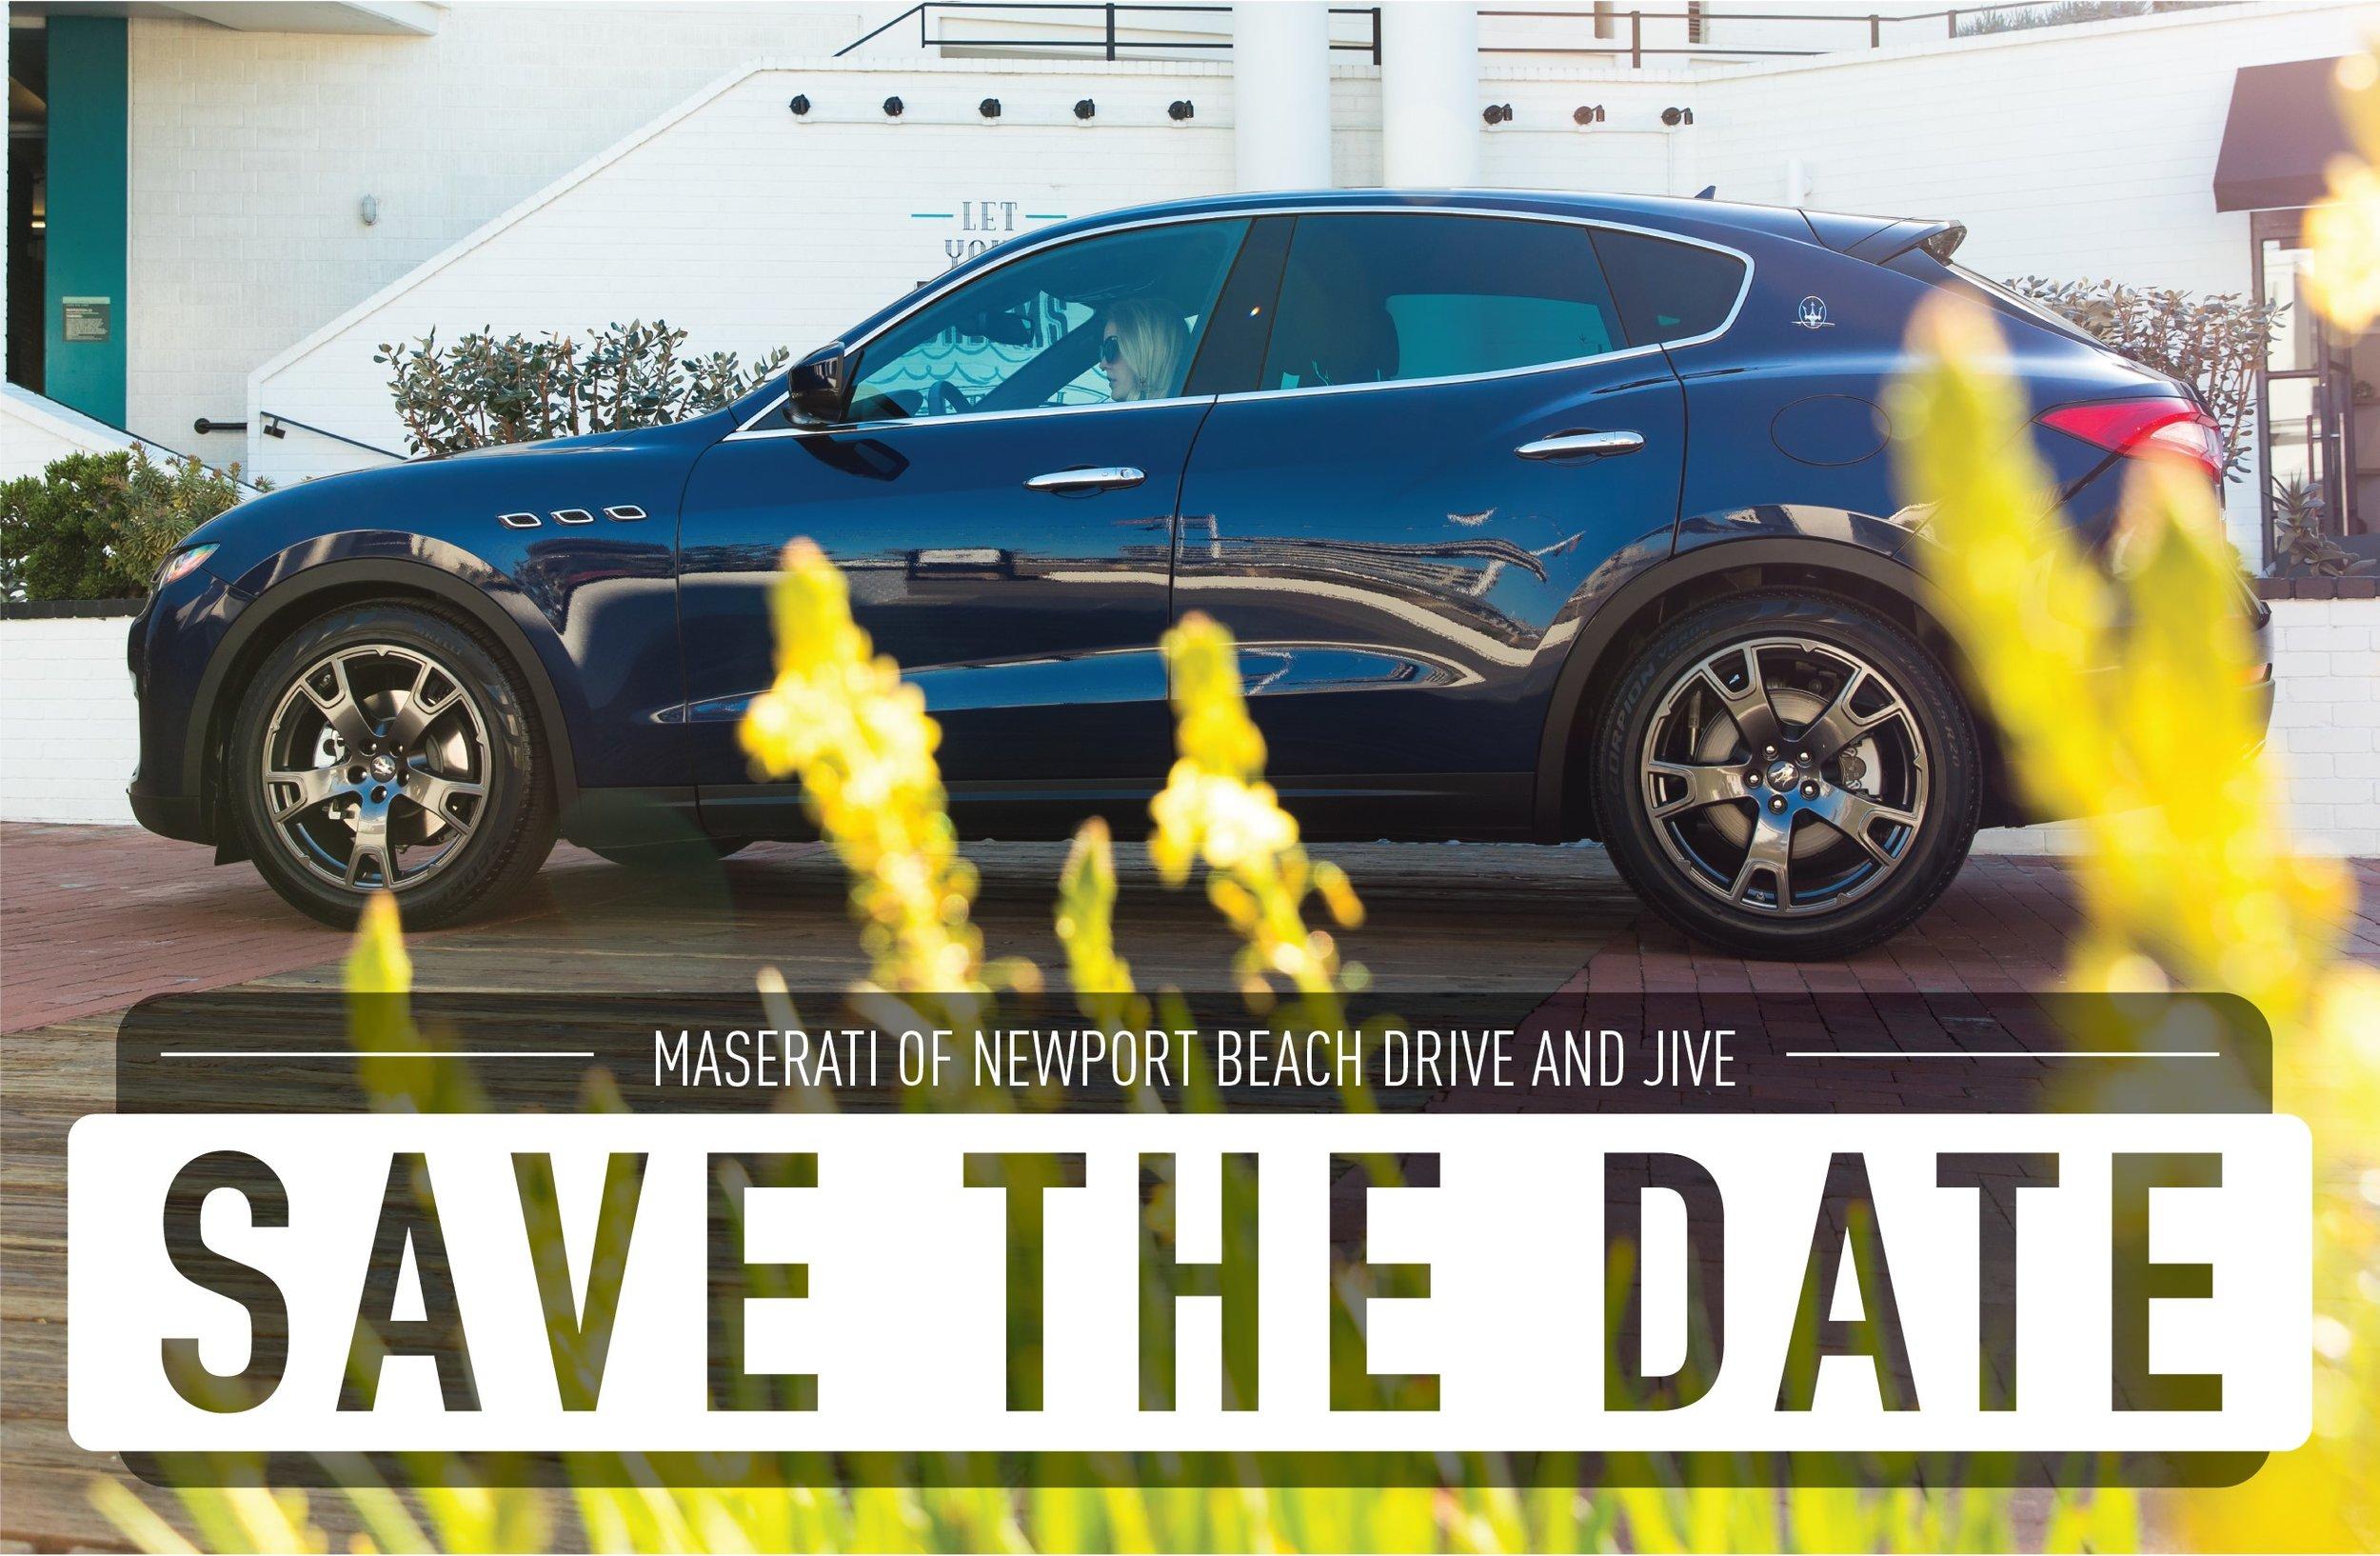 Maserati Save the Date Test Drive.jpg